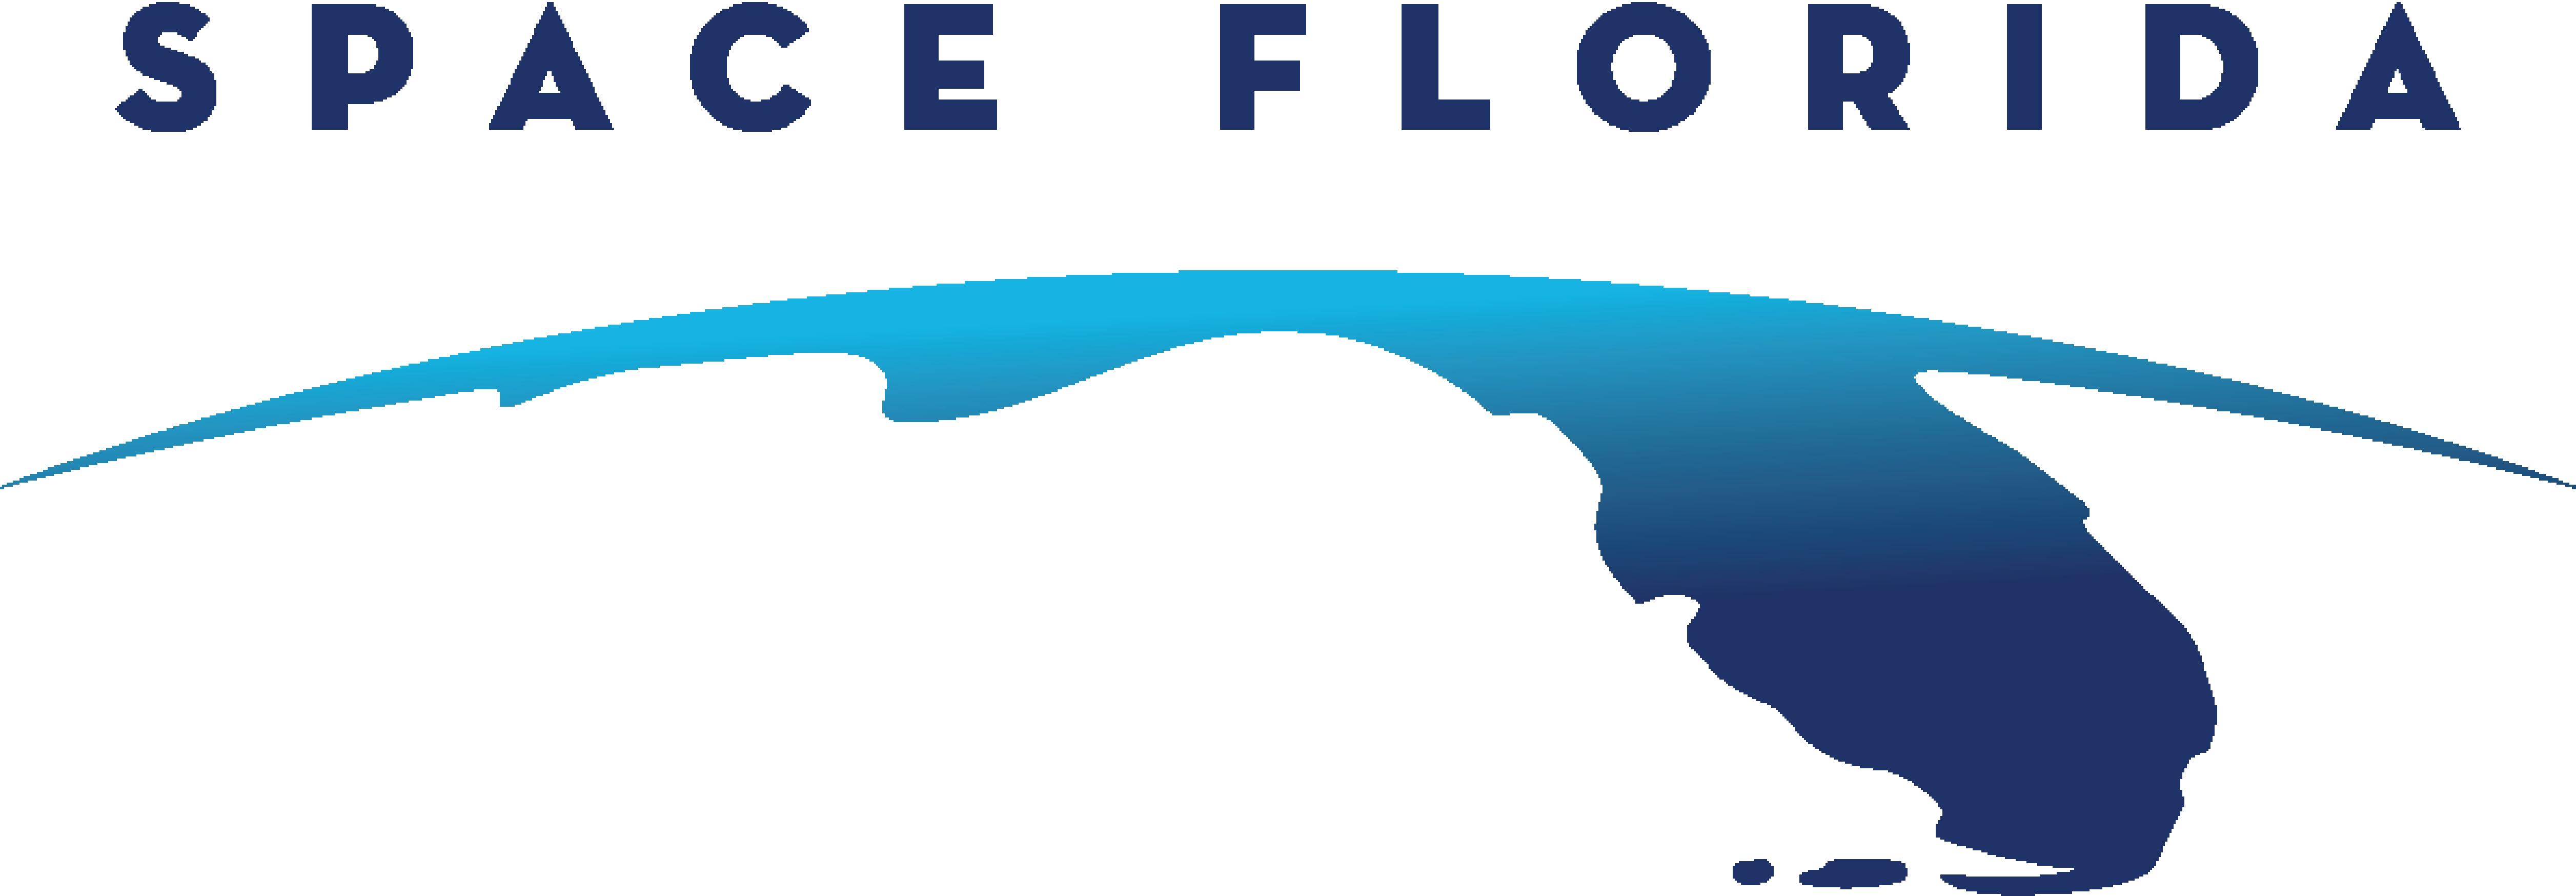 SpaceFlorida